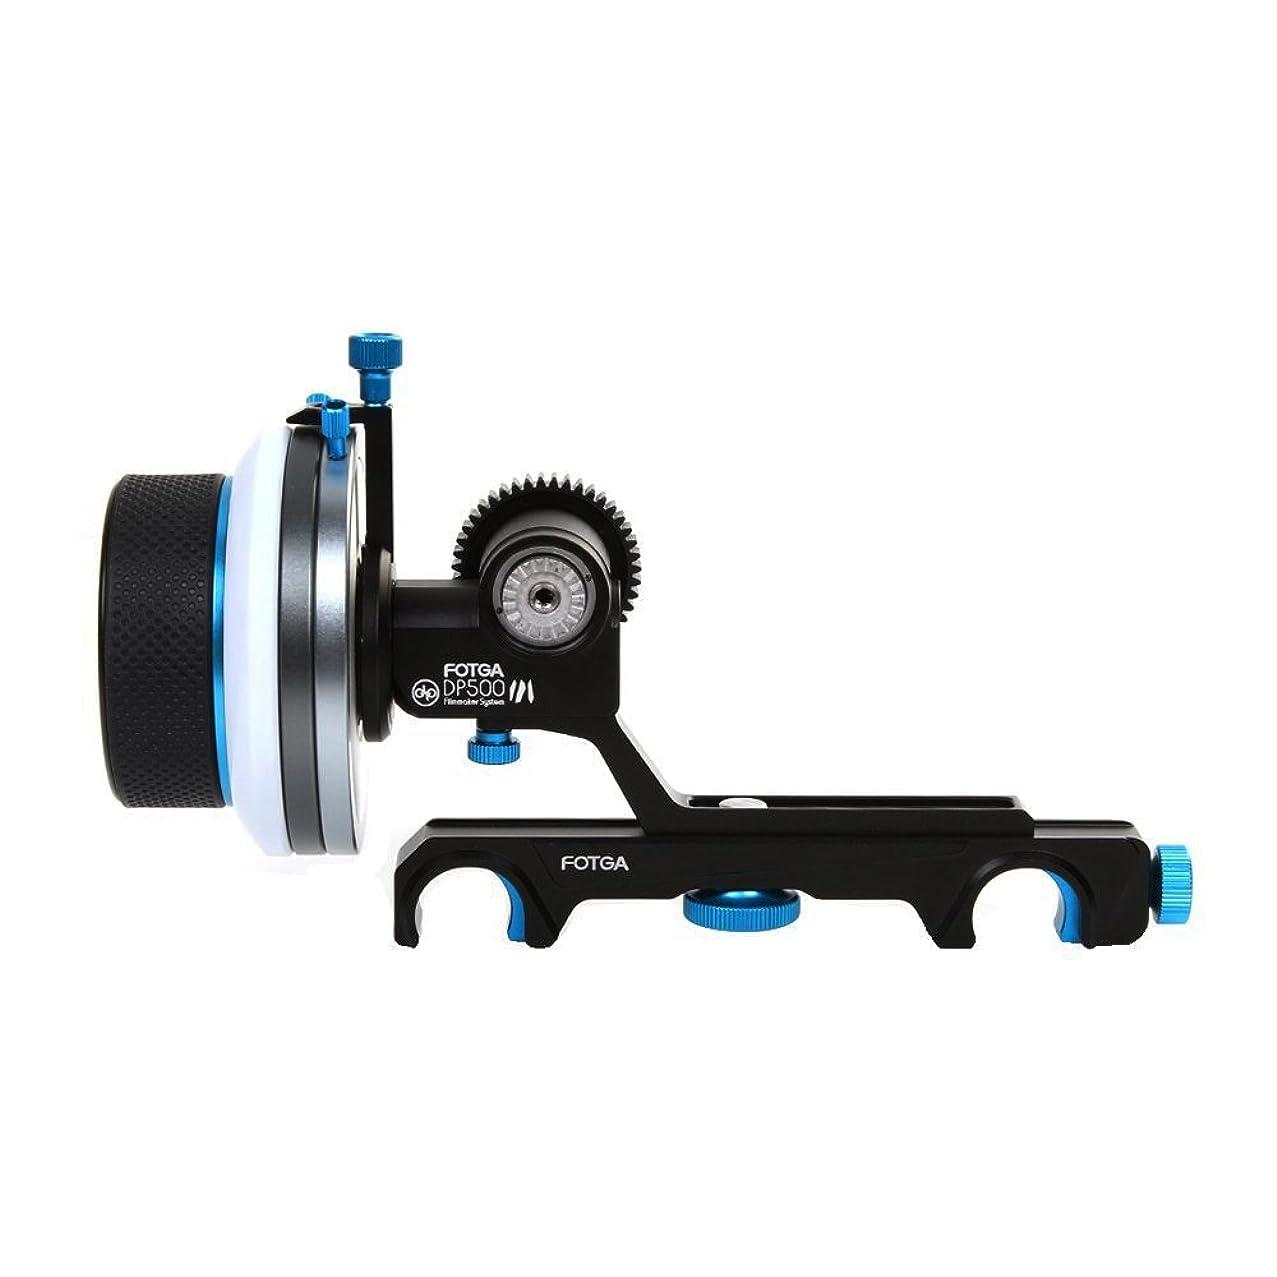 Fotga DP500III QR Quick Release A/B Hard Stop Follow Focus for 19mm Rail Base Plate DSLR Rig, Video Filmmaking